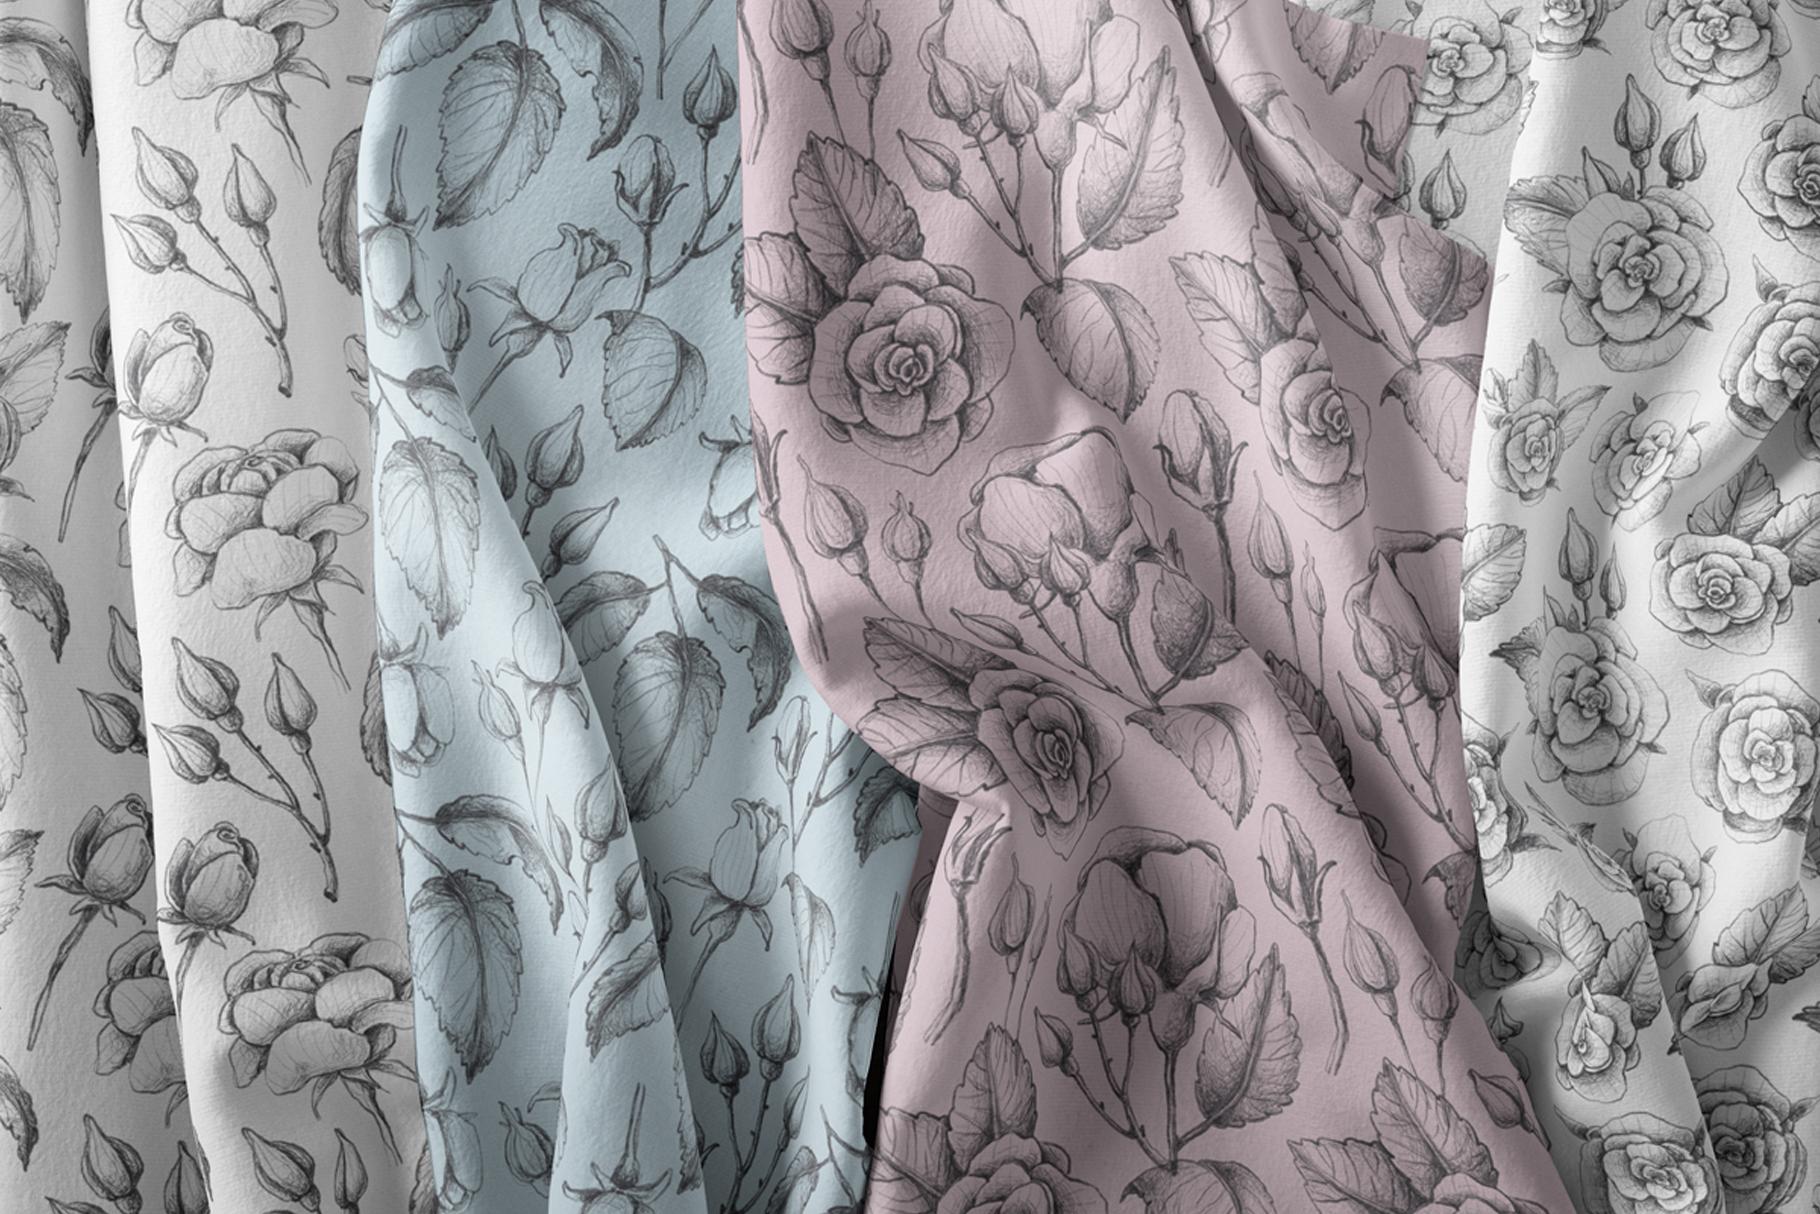 Sketched roses, patterns, frames example image 7